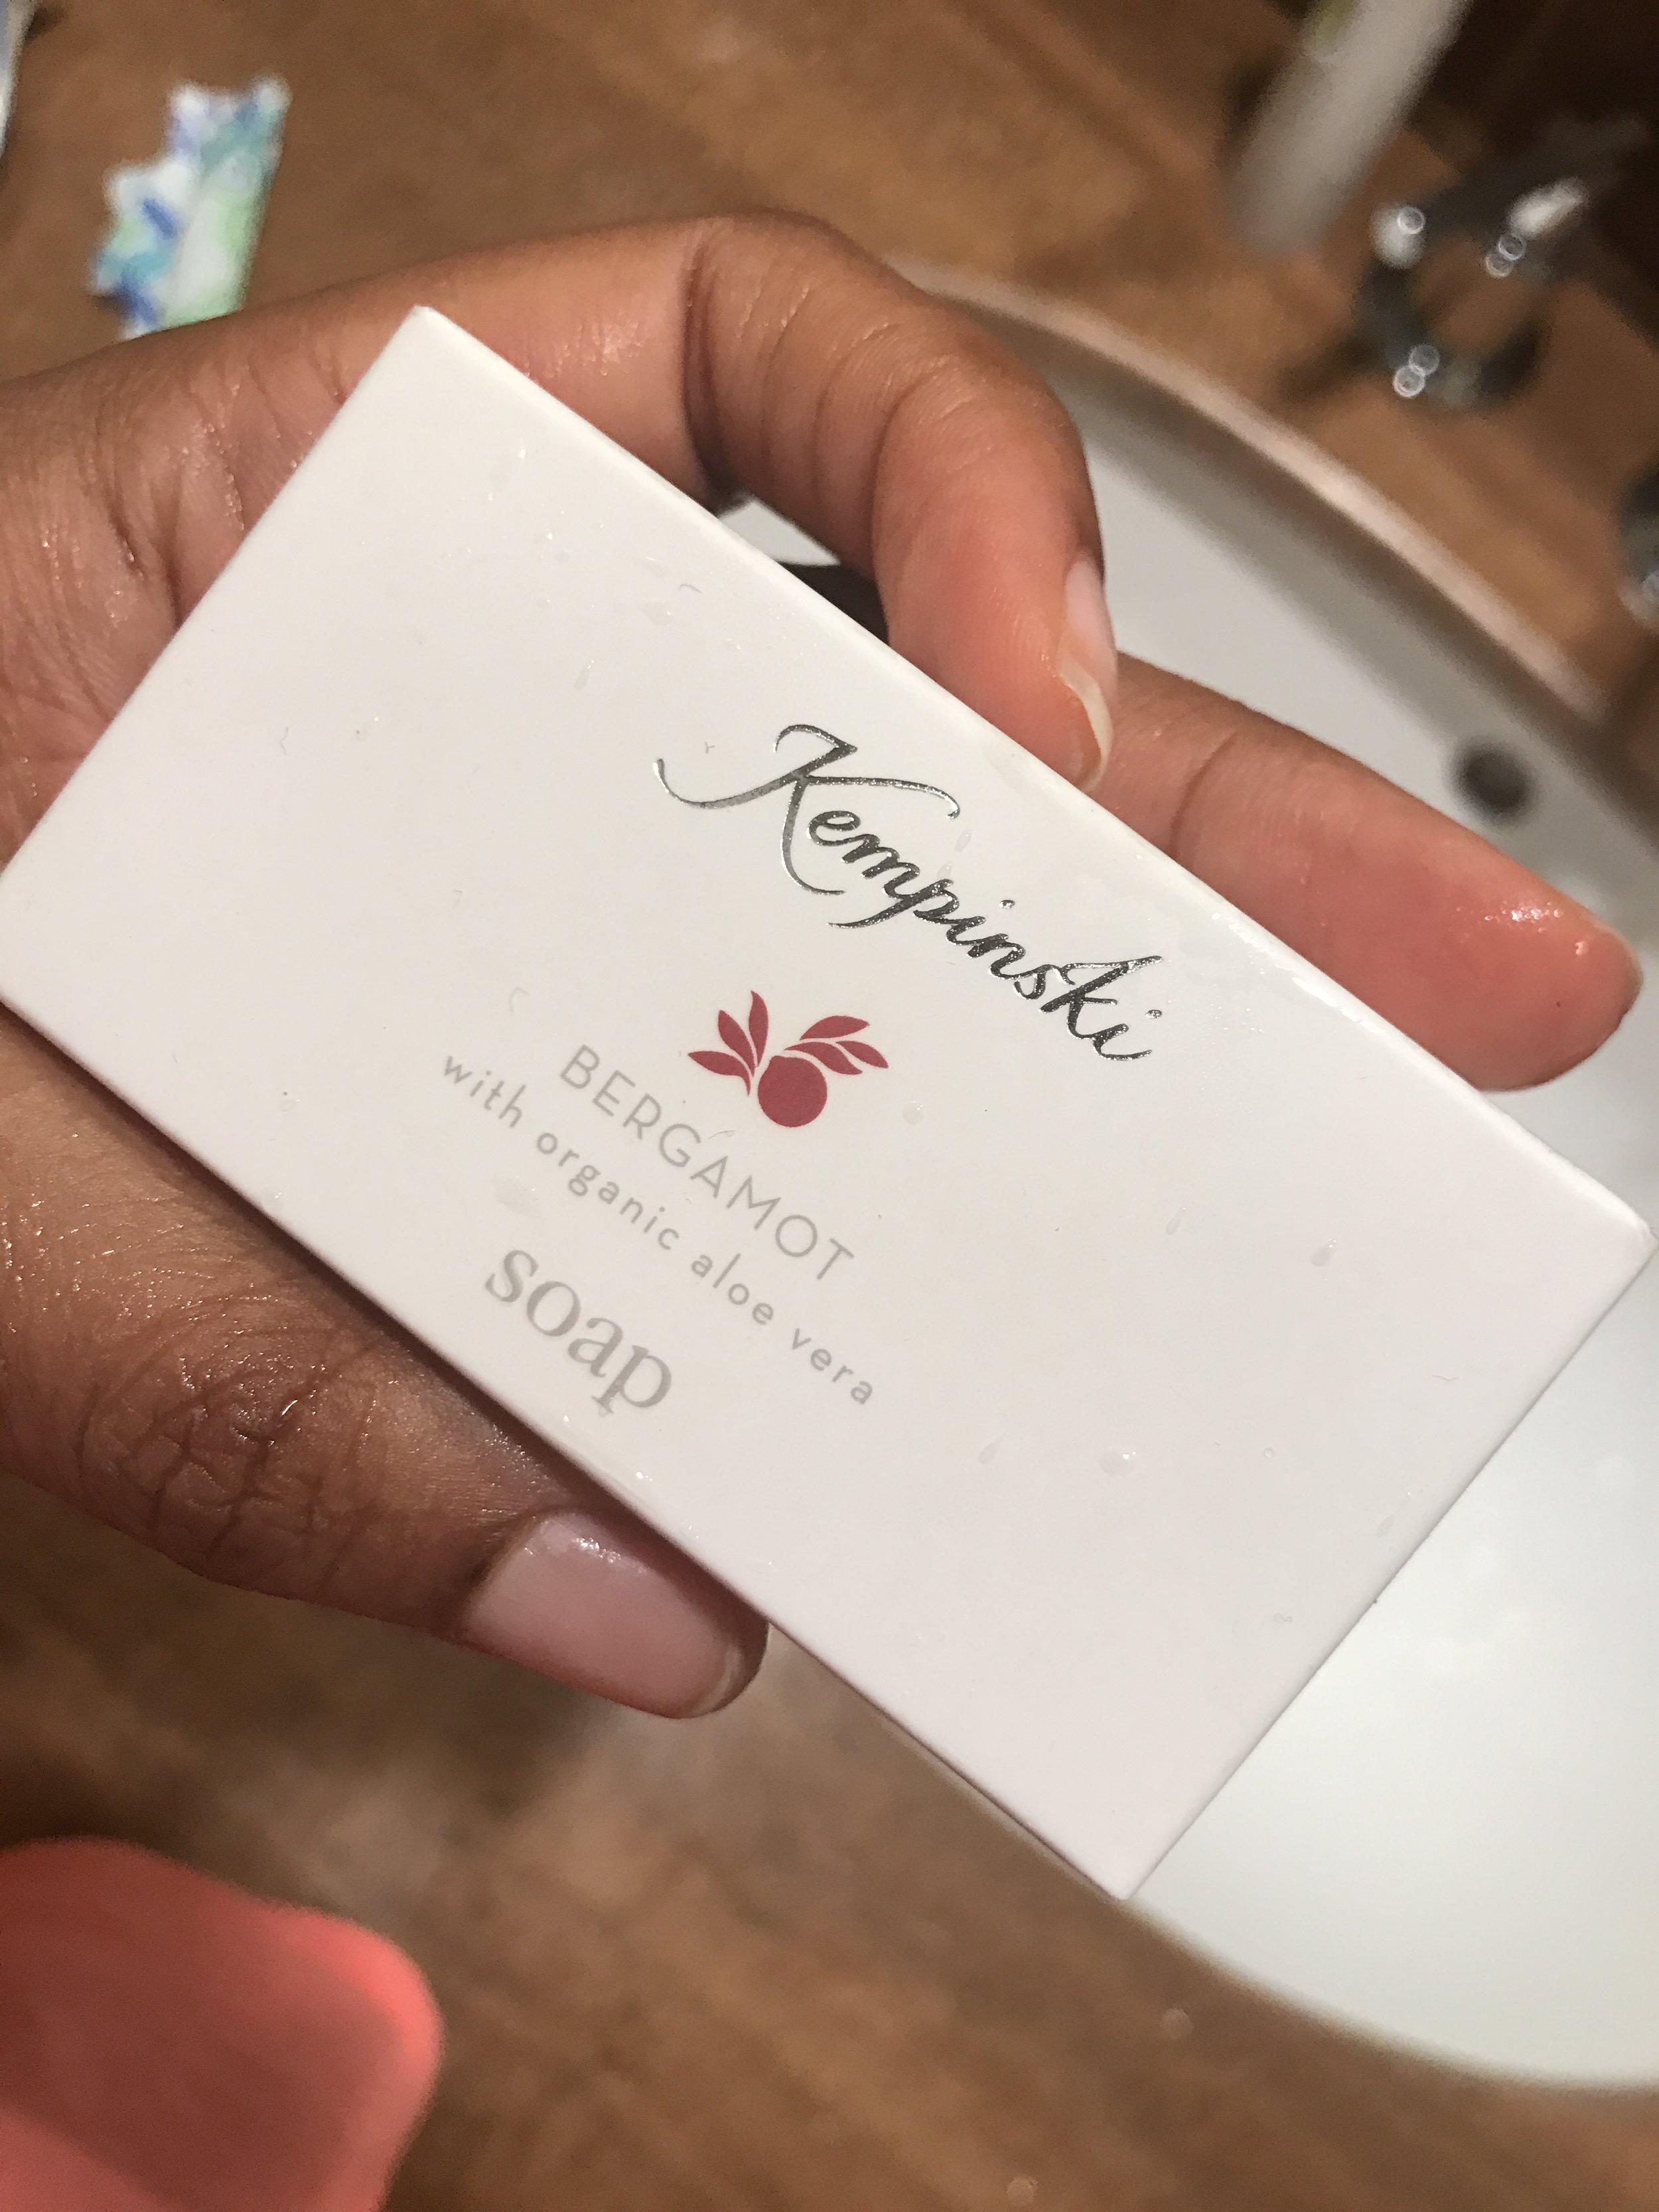 Kempinski-Goldcoast-Accra-Hotel-Review-Photos-vickieremoeofficial9.JPG